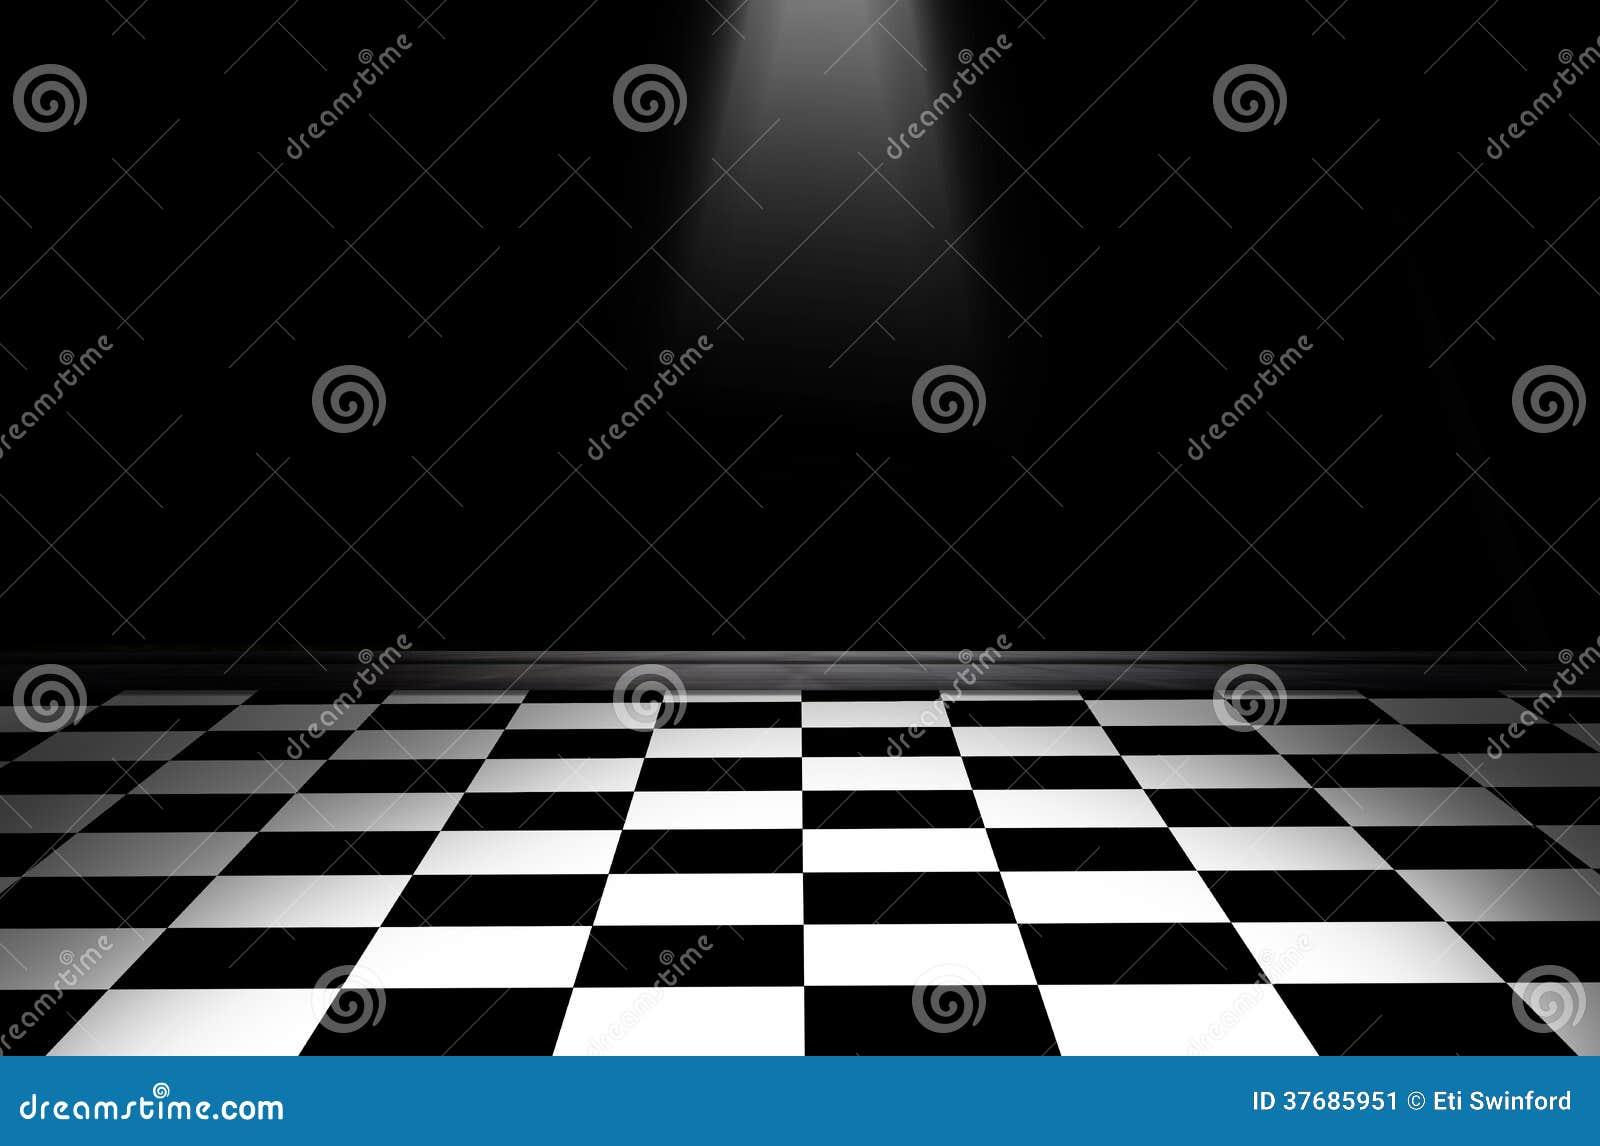 plancher carreaux noir et blanc image stock image. Black Bedroom Furniture Sets. Home Design Ideas